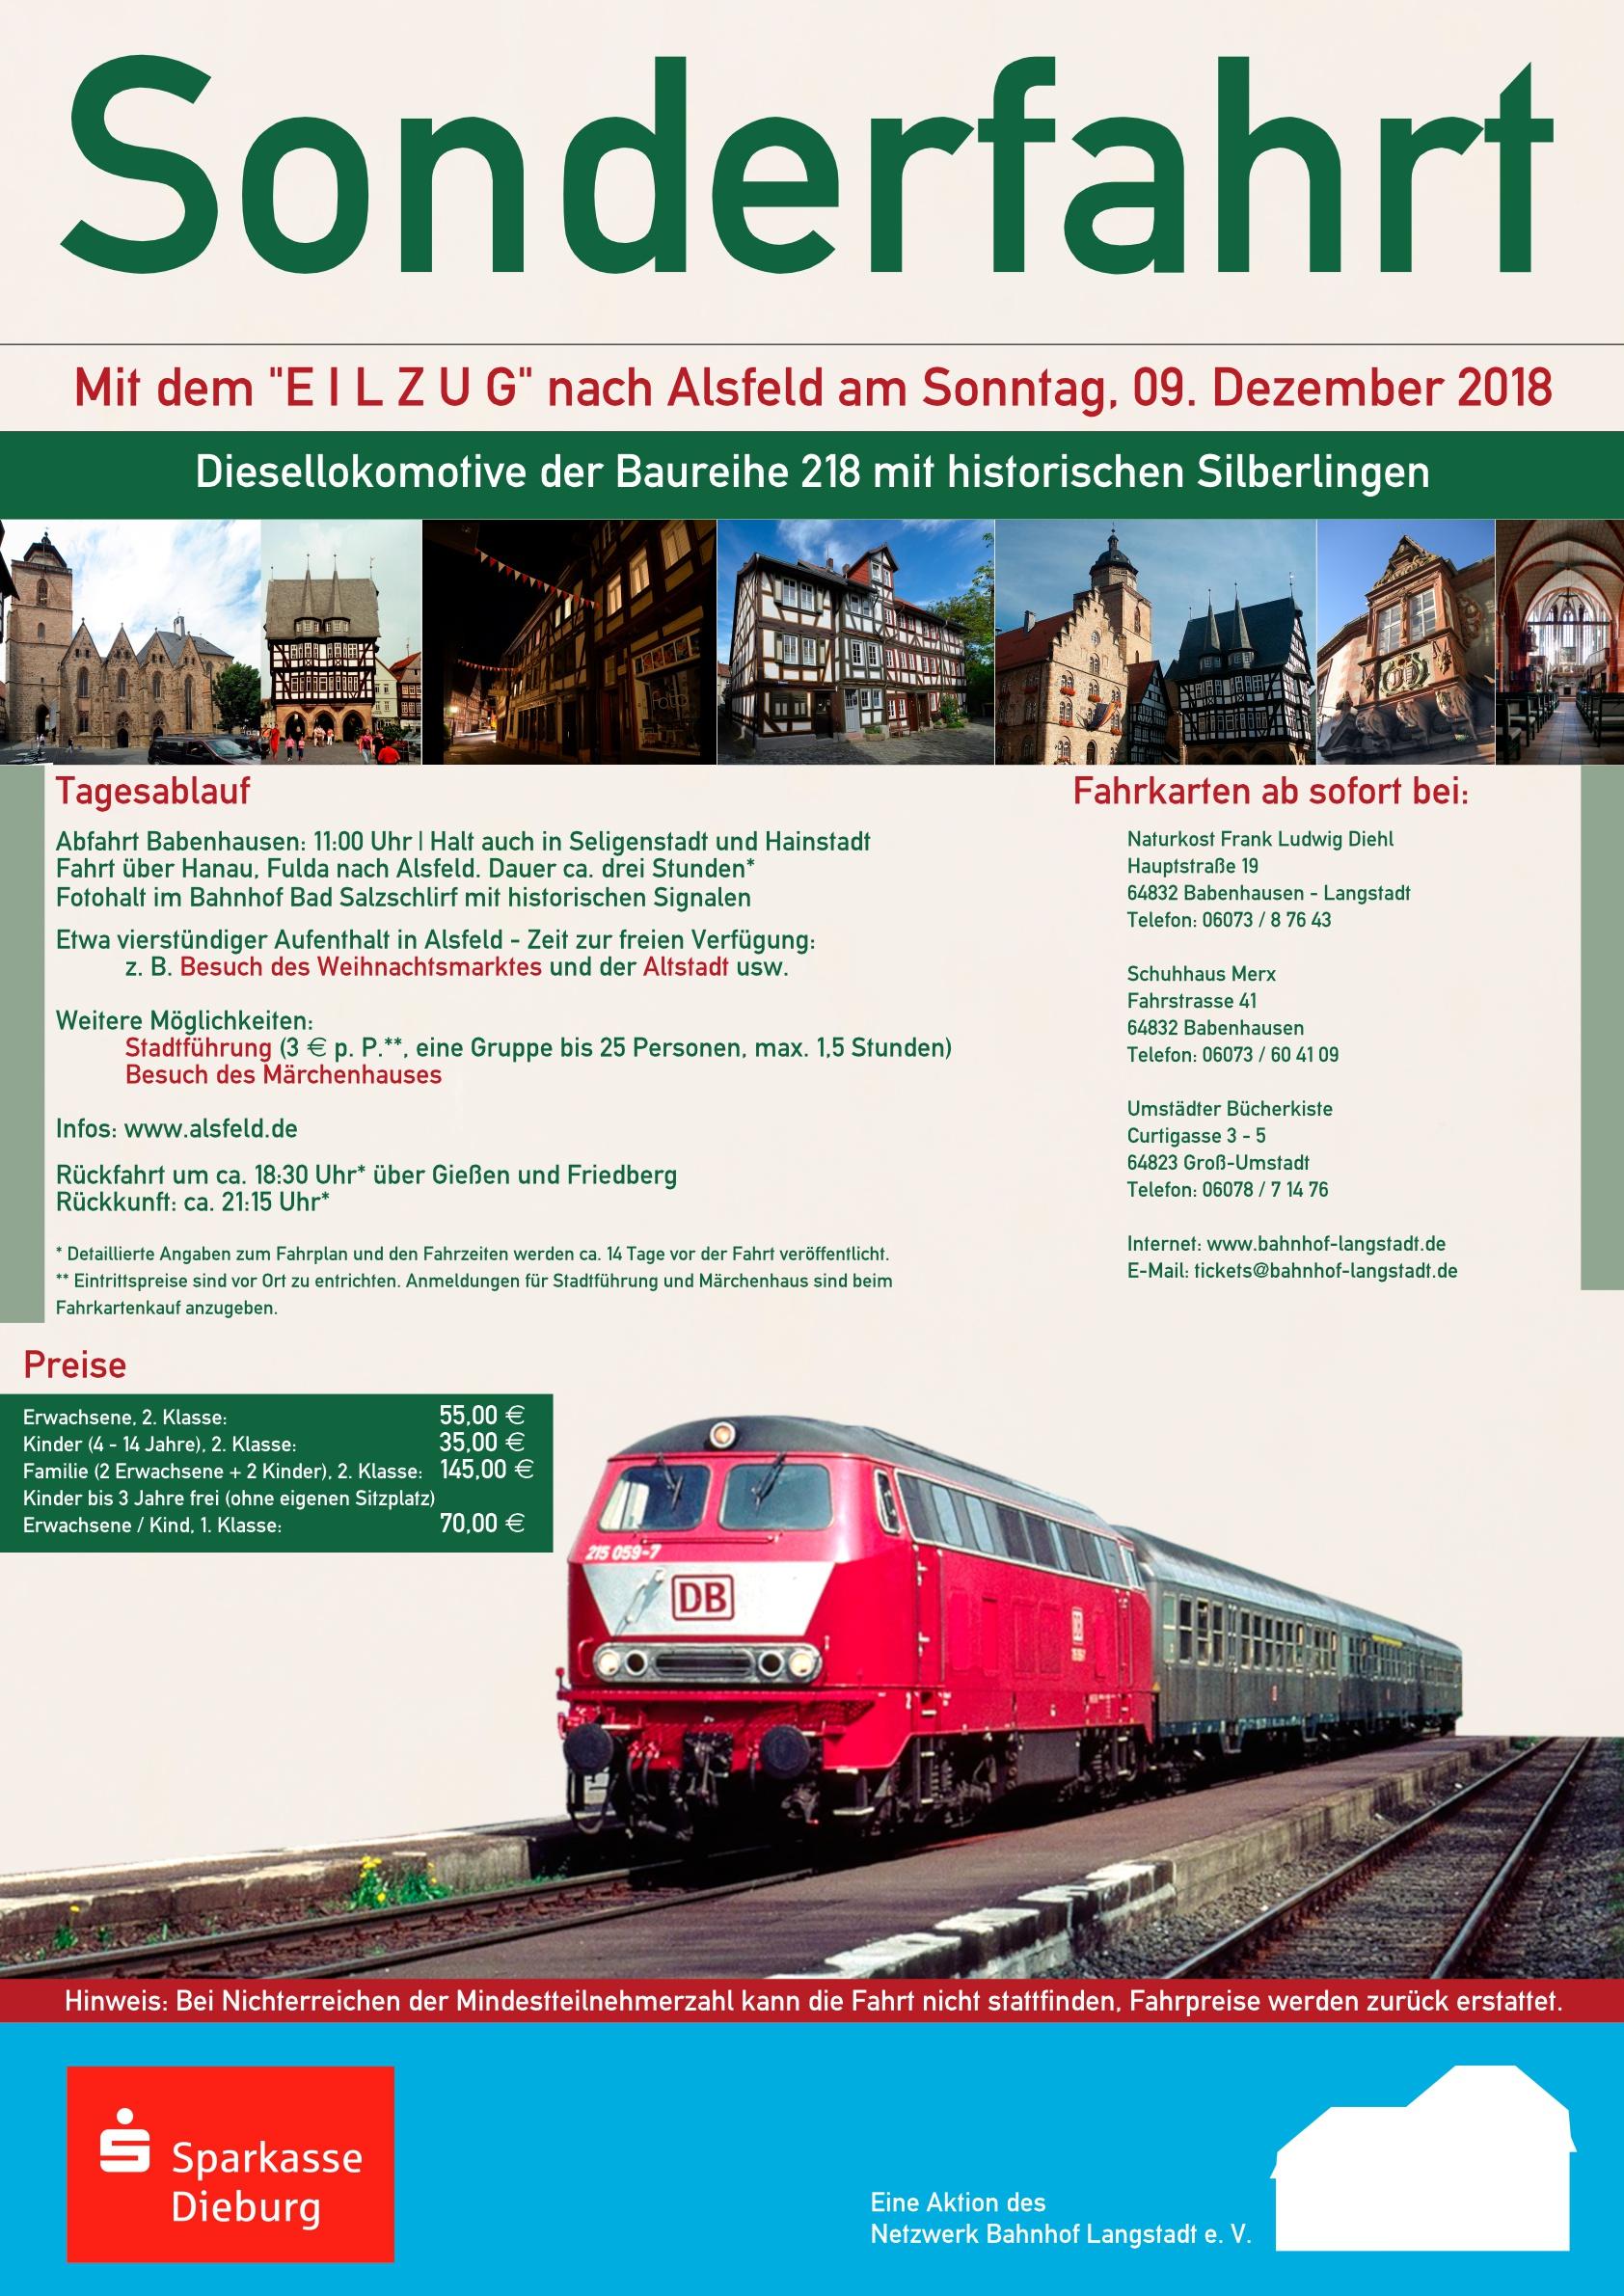 Netzwerk Bahnhof Langstadt Plakat Sonderfahrt Dez 2018